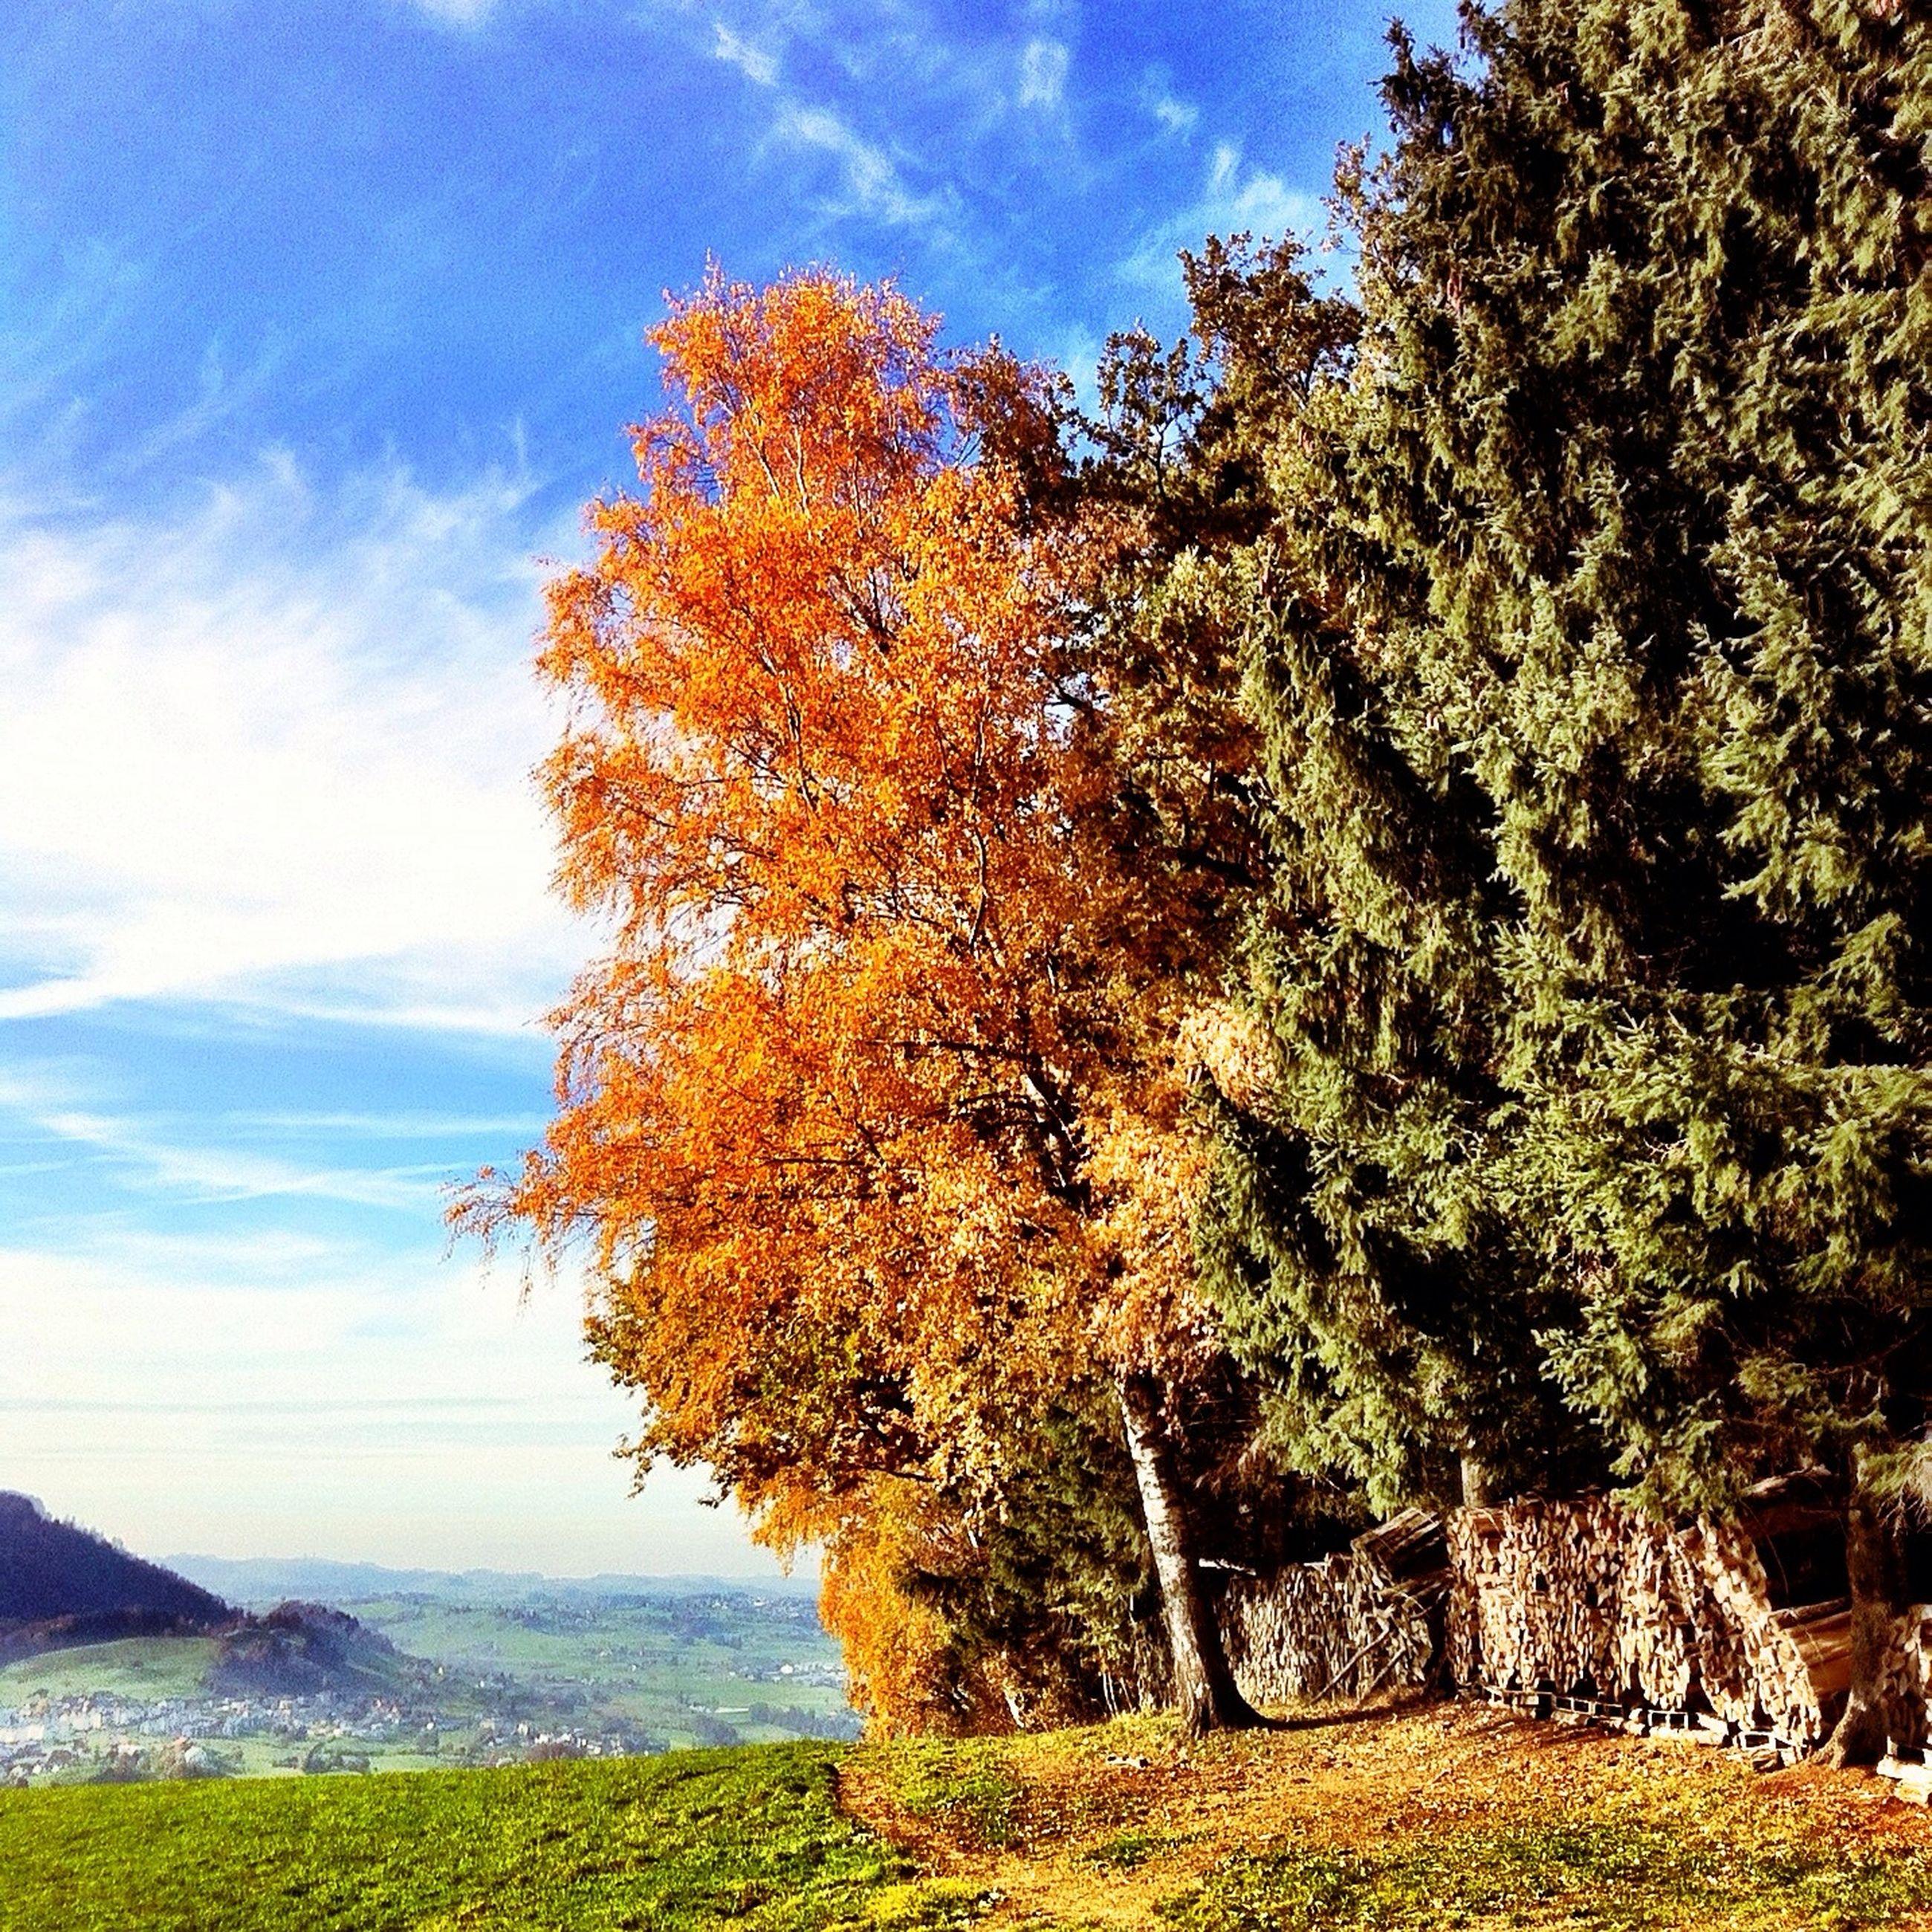 tree, tranquility, sky, tranquil scene, beauty in nature, scenics, nature, growth, landscape, autumn, field, cloud - sky, change, season, non-urban scene, grass, cloud, idyllic, day, plant